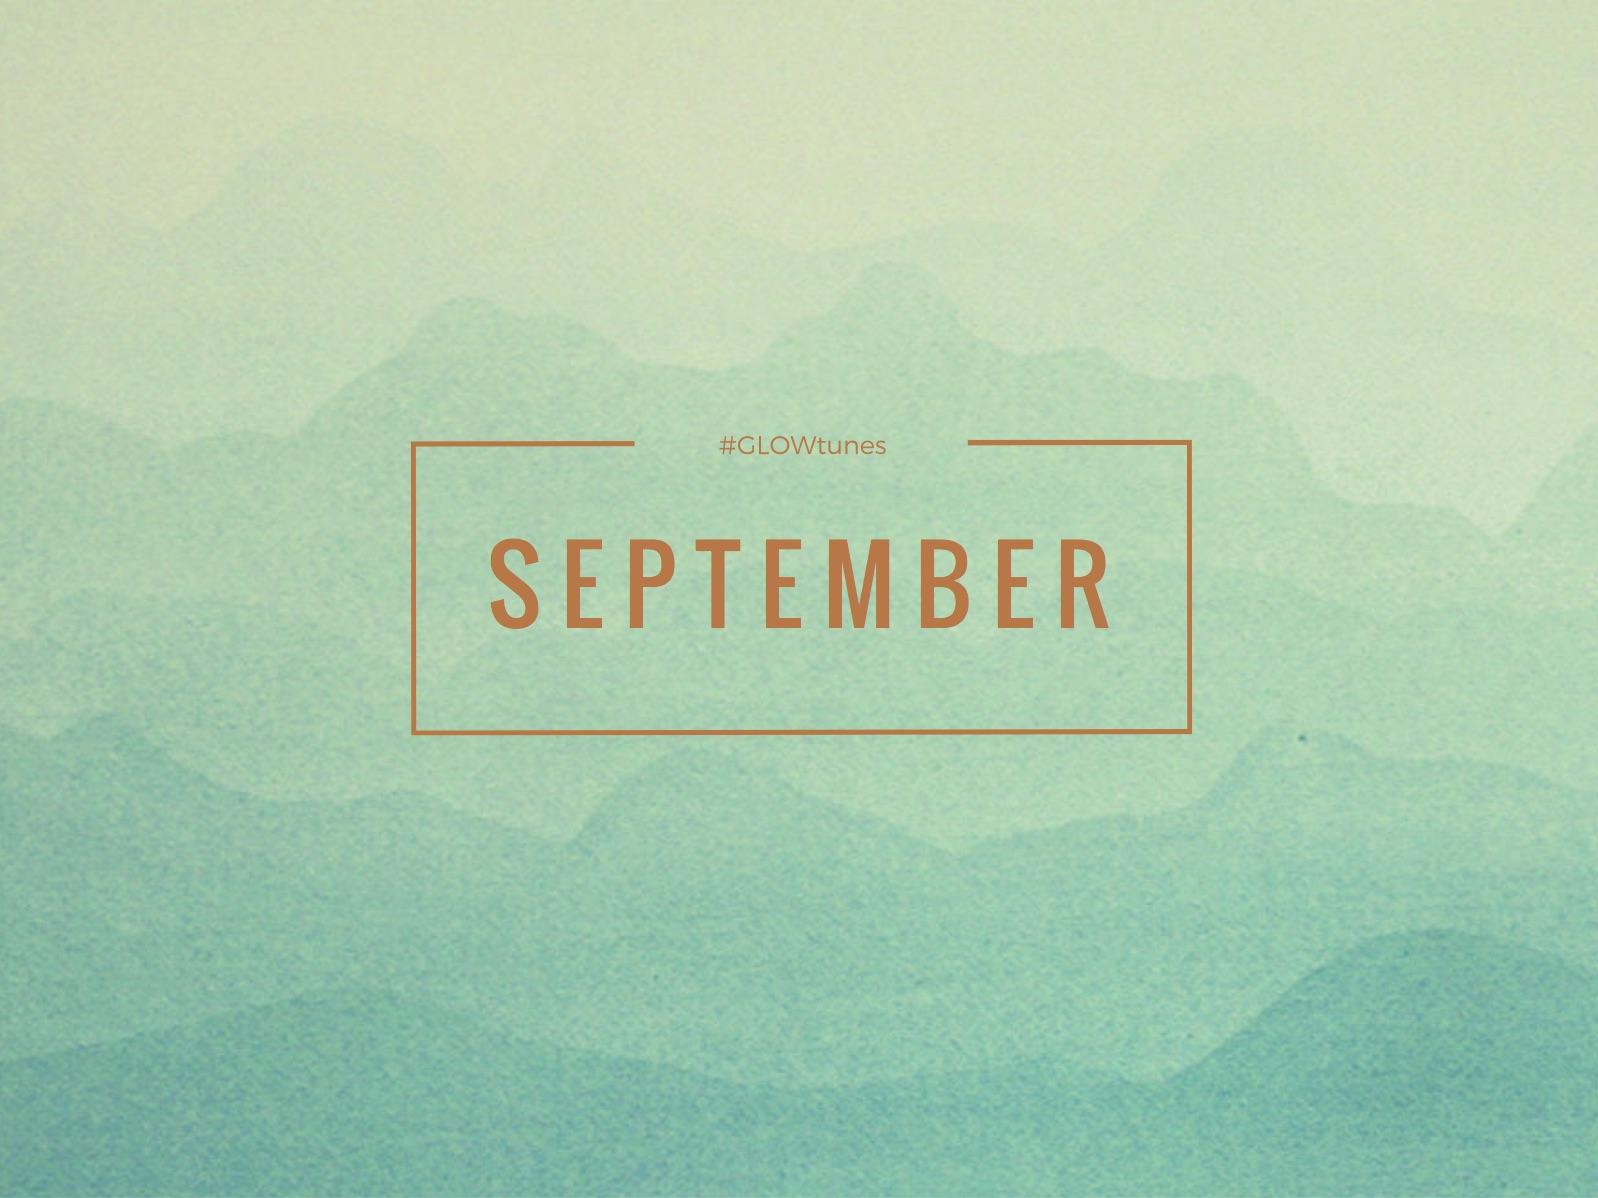 GLOWtunes_Sept17.jpg